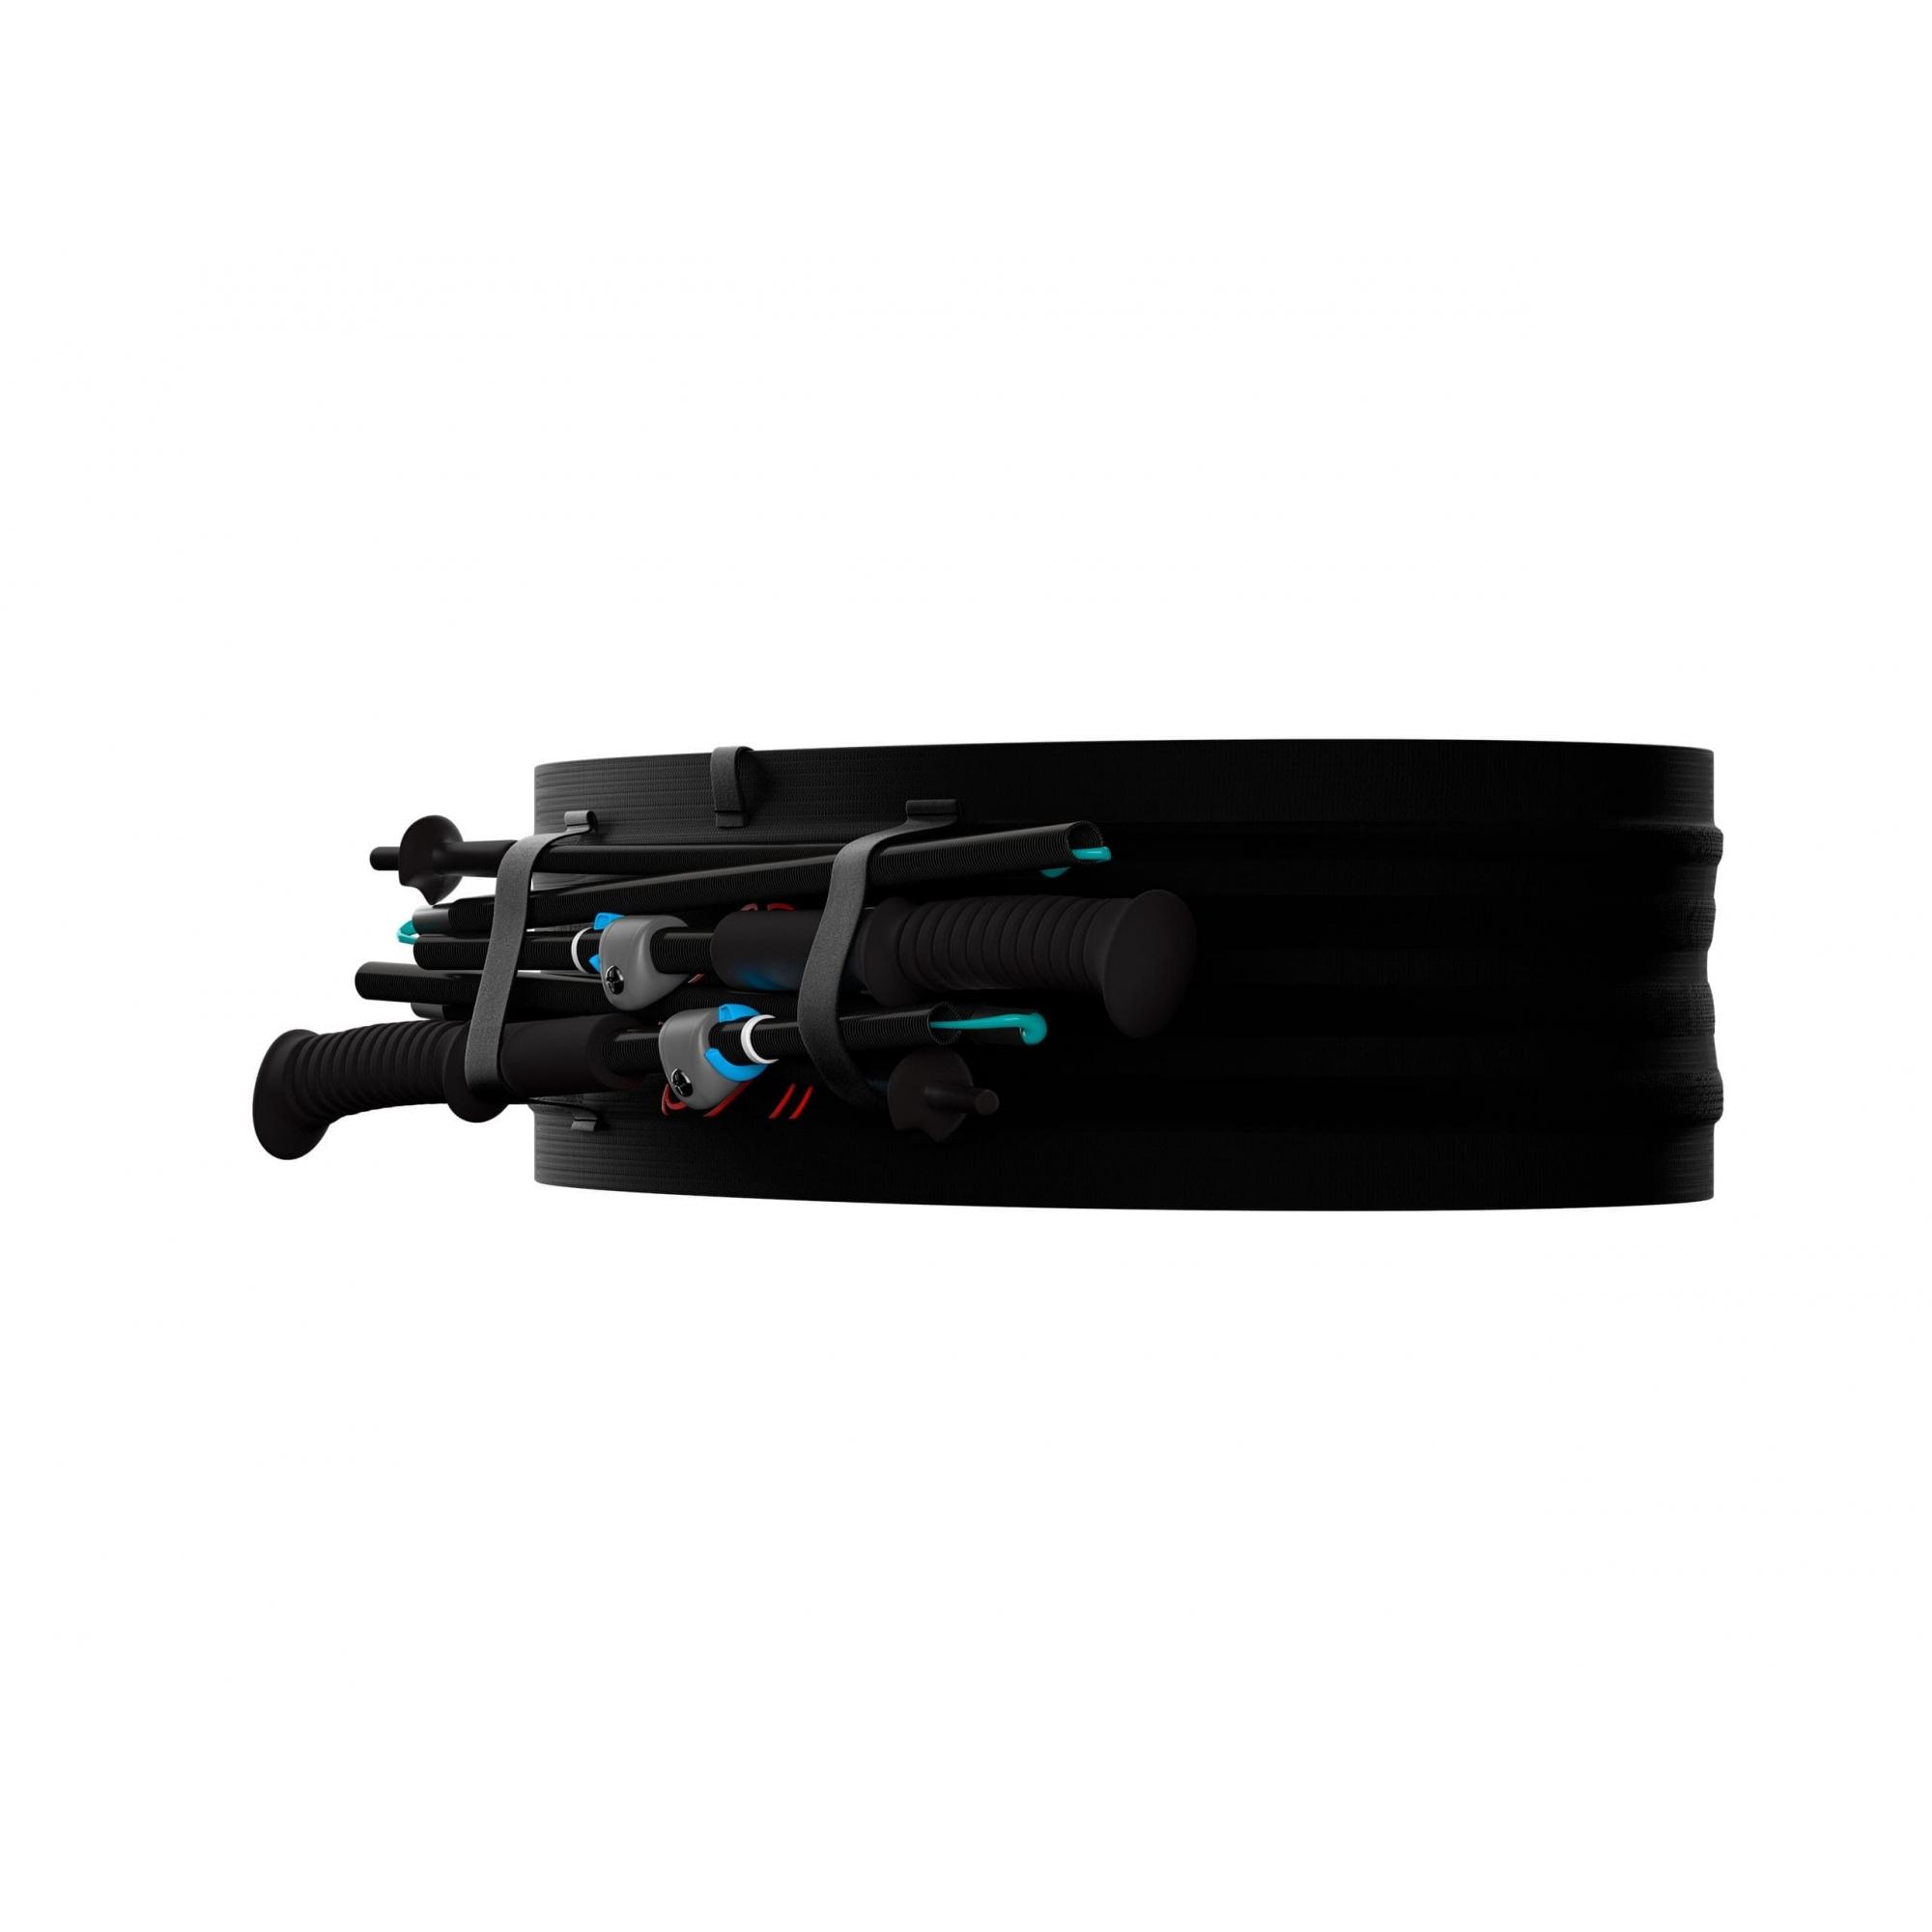 Cinto Multifuncional Free Belt Pro New Unissex Compressport